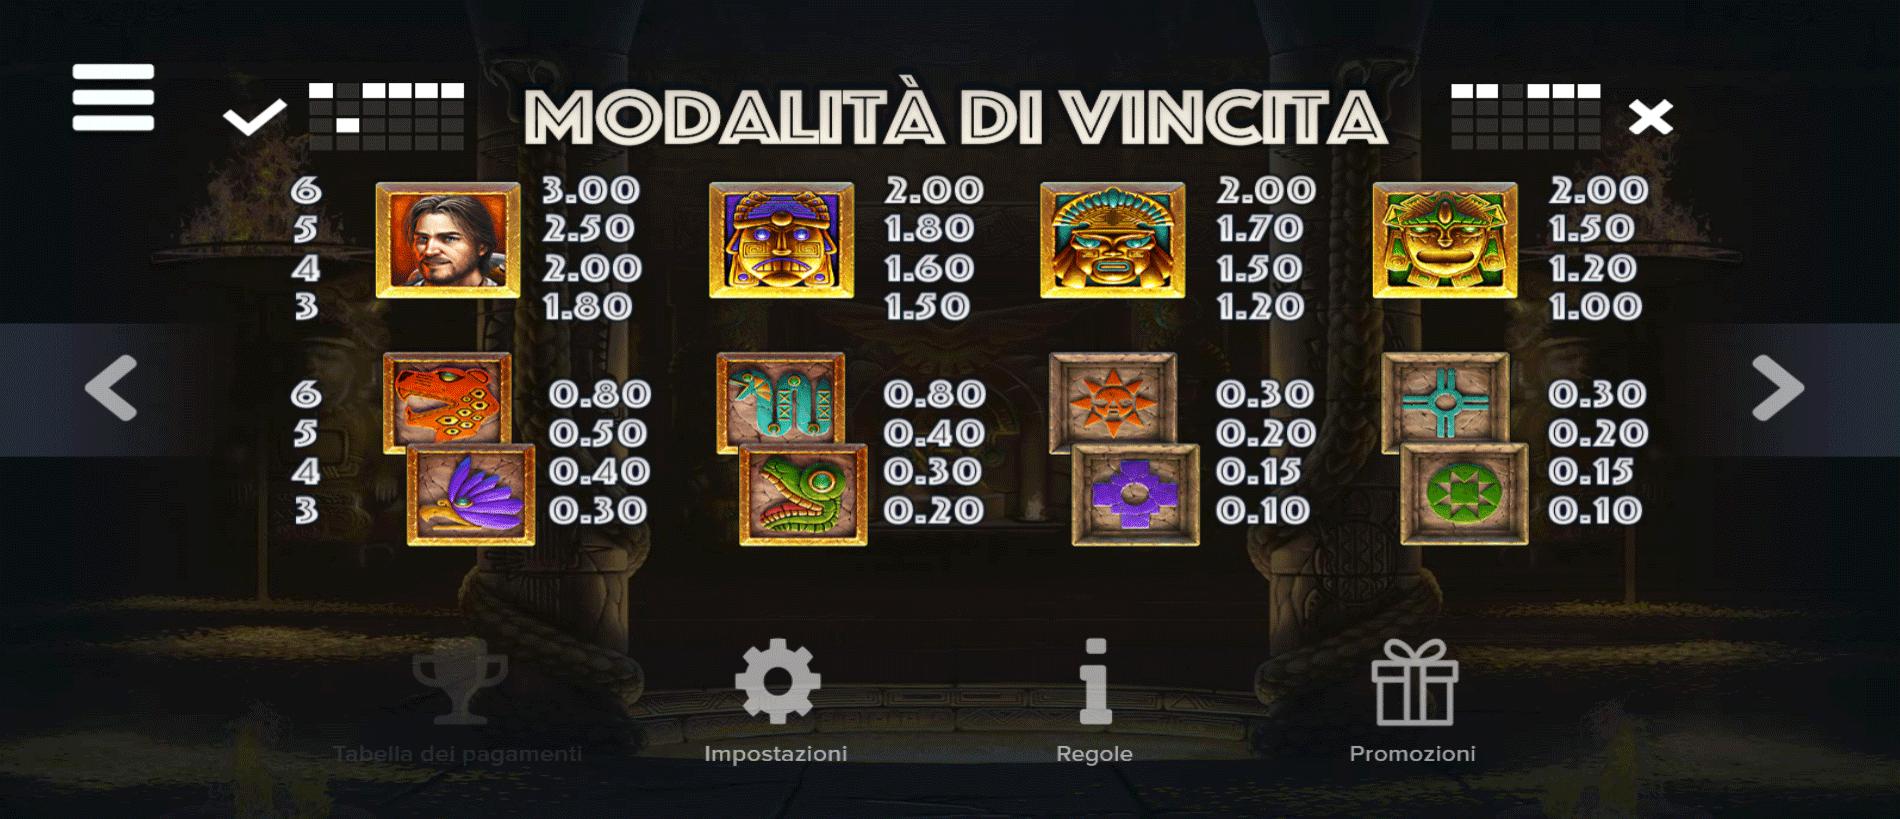 simboli della slot machine ecuador gold